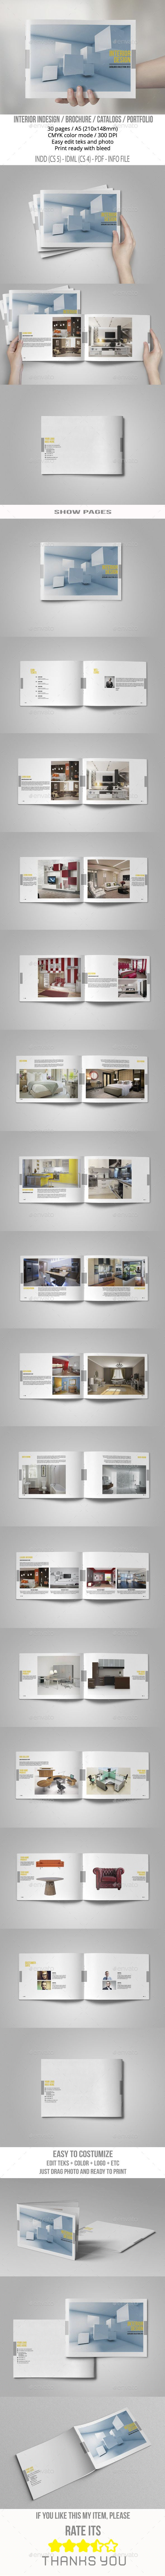 A5 Catalogs Interior - Brochures Print Templates